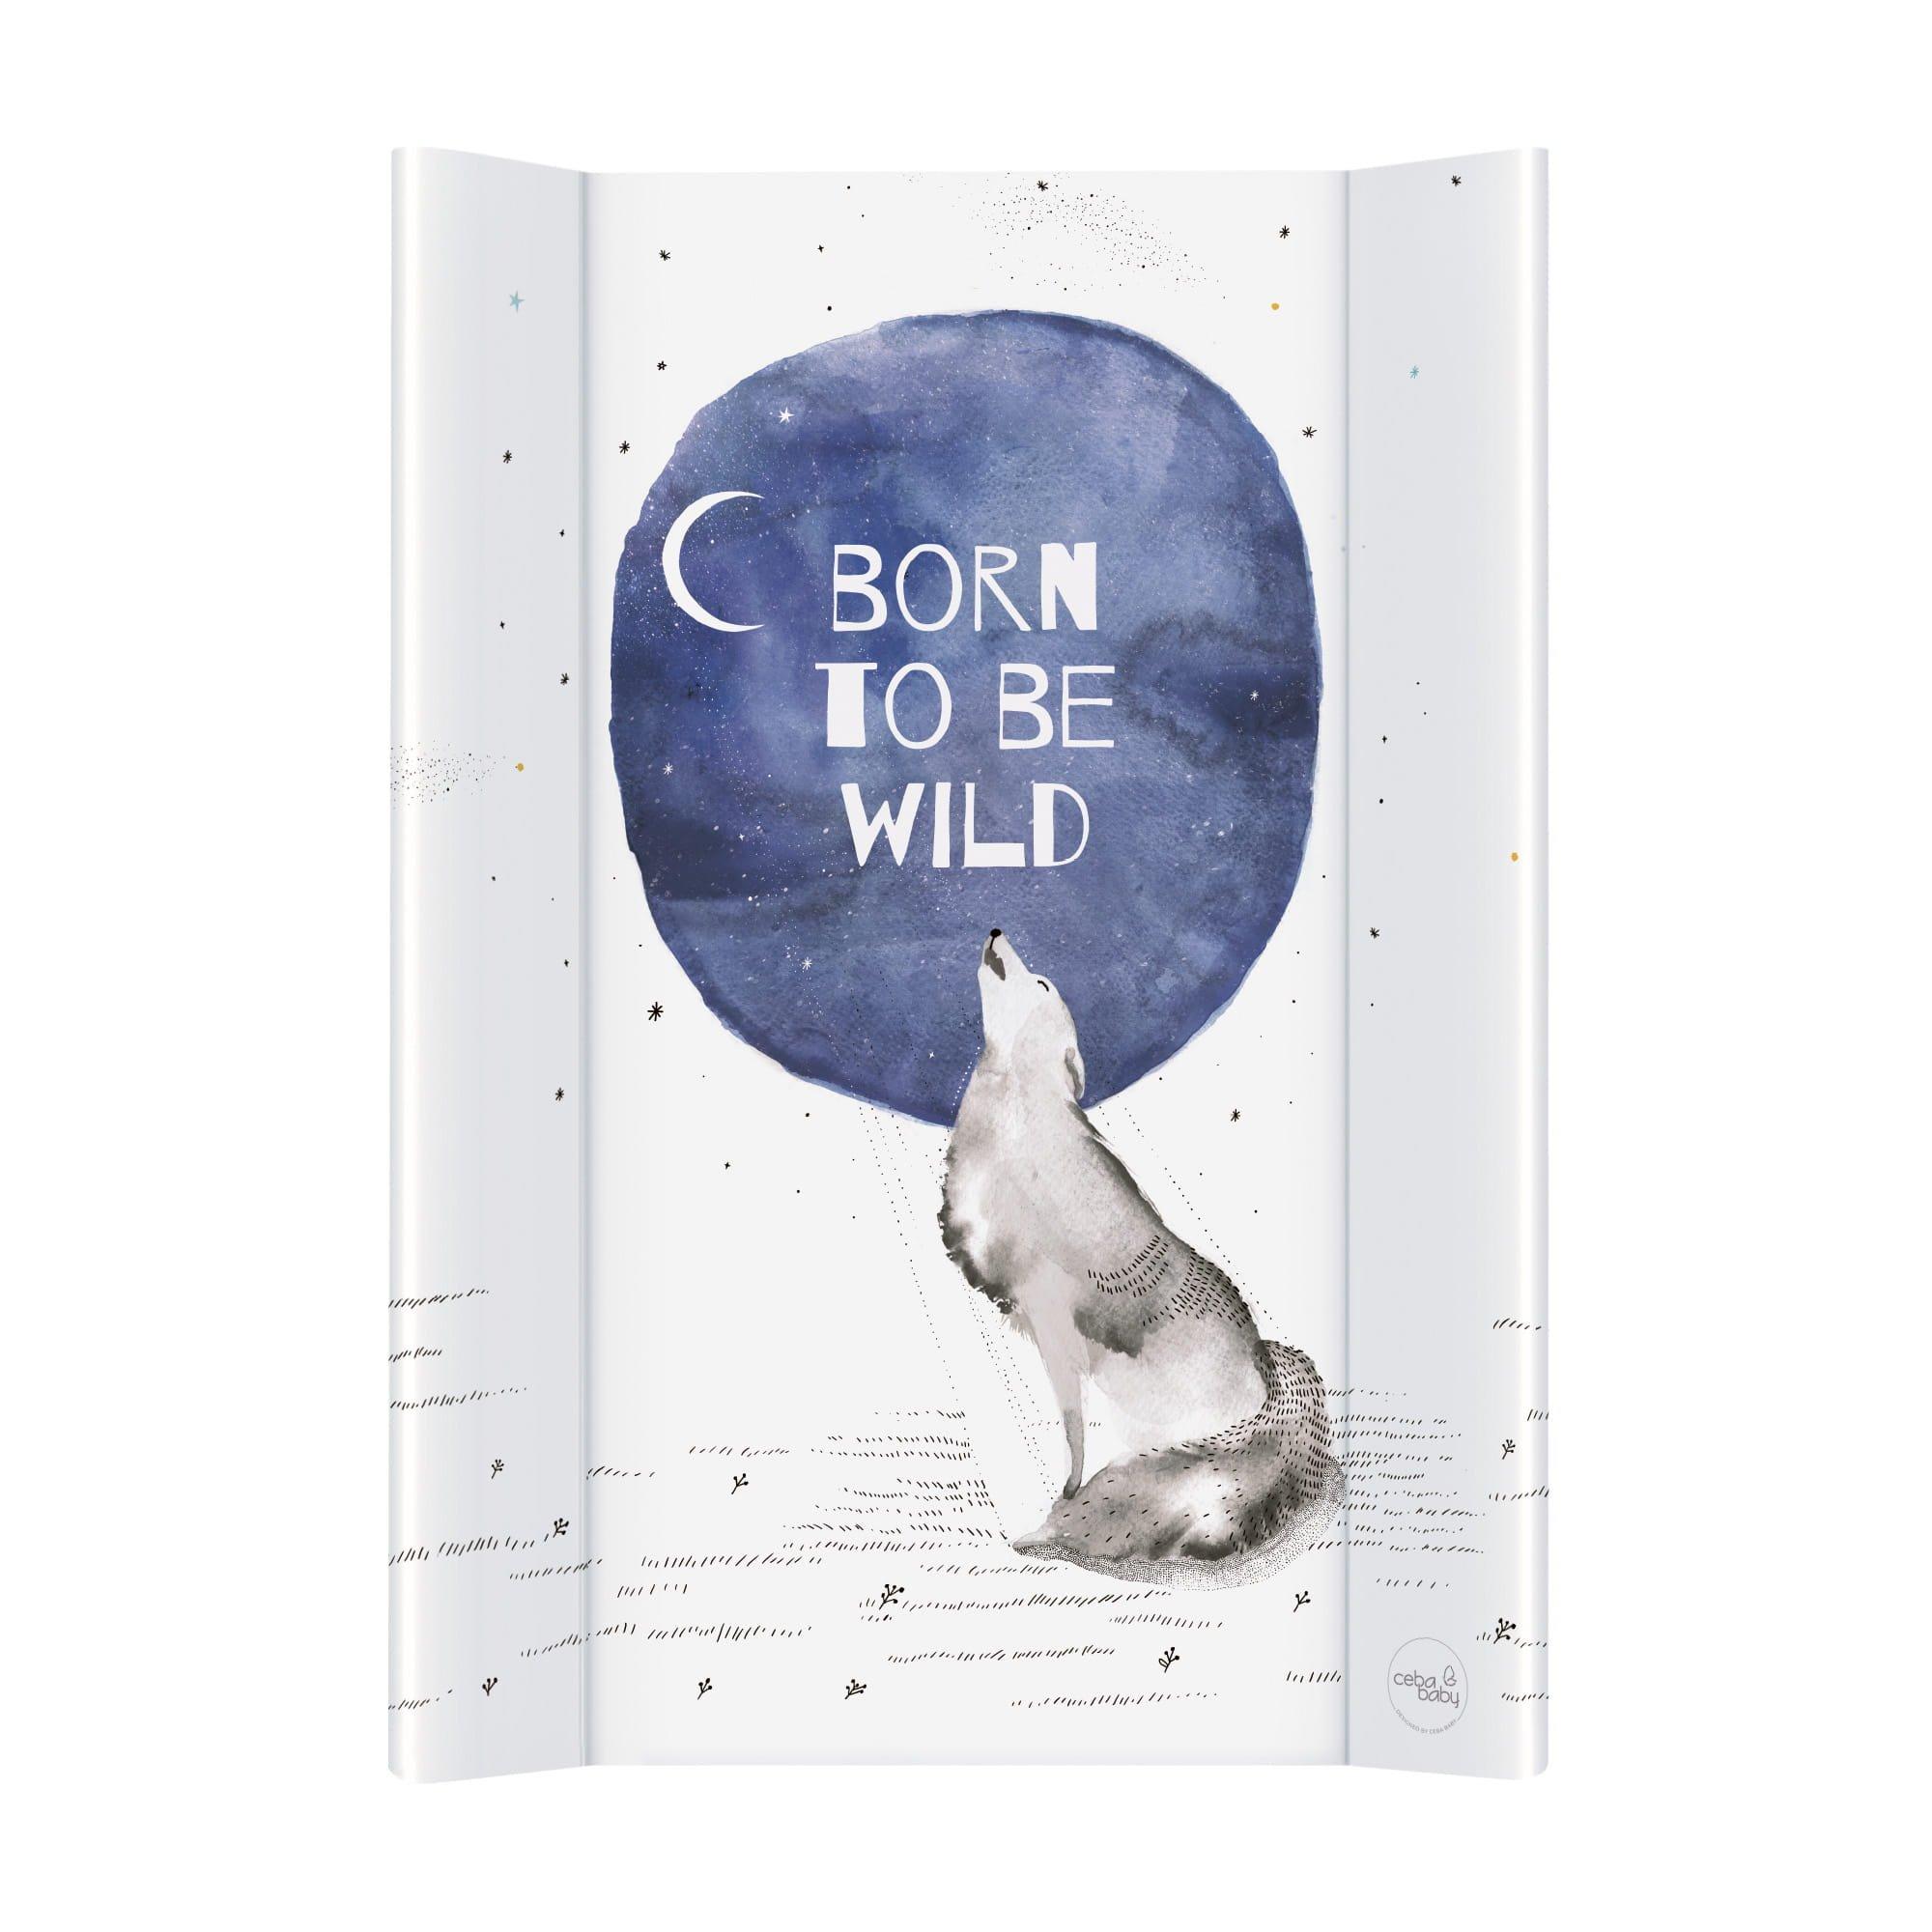 Pøebalovací podložka 2-hranná mìkká 50x70 cm Born to be wild